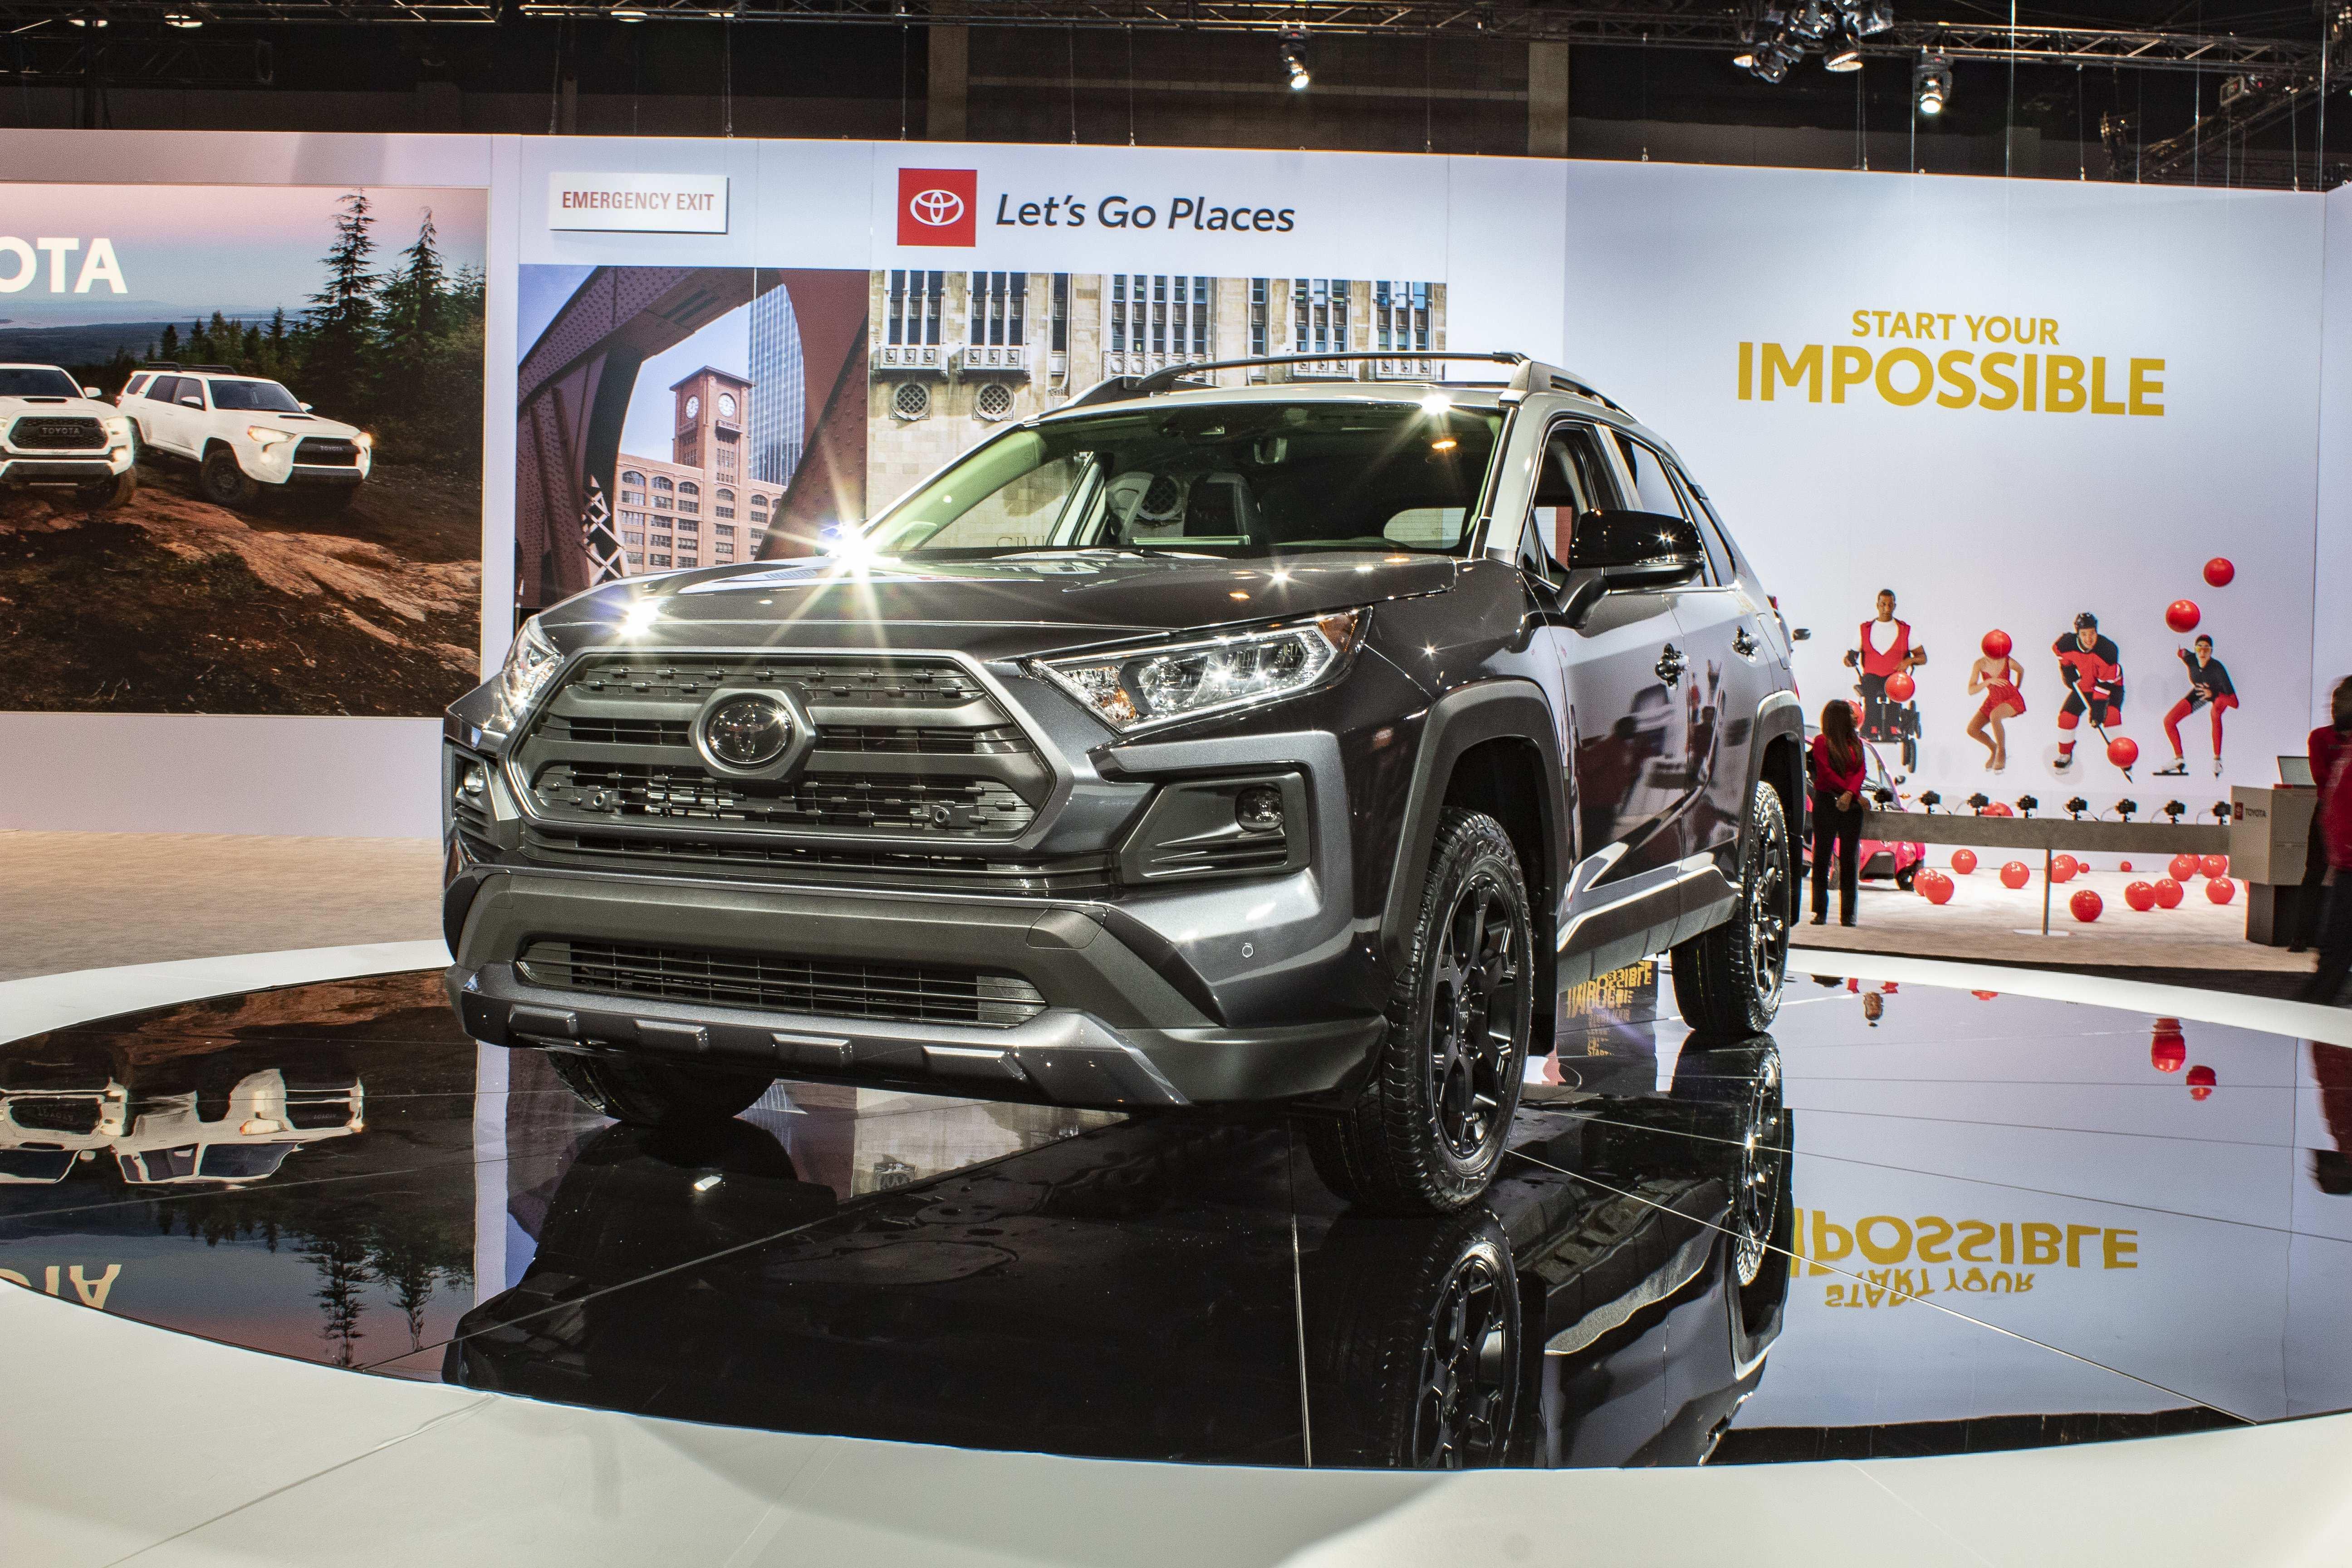 81 All New Toyota Bev 2020 Engine by Toyota Bev 2020